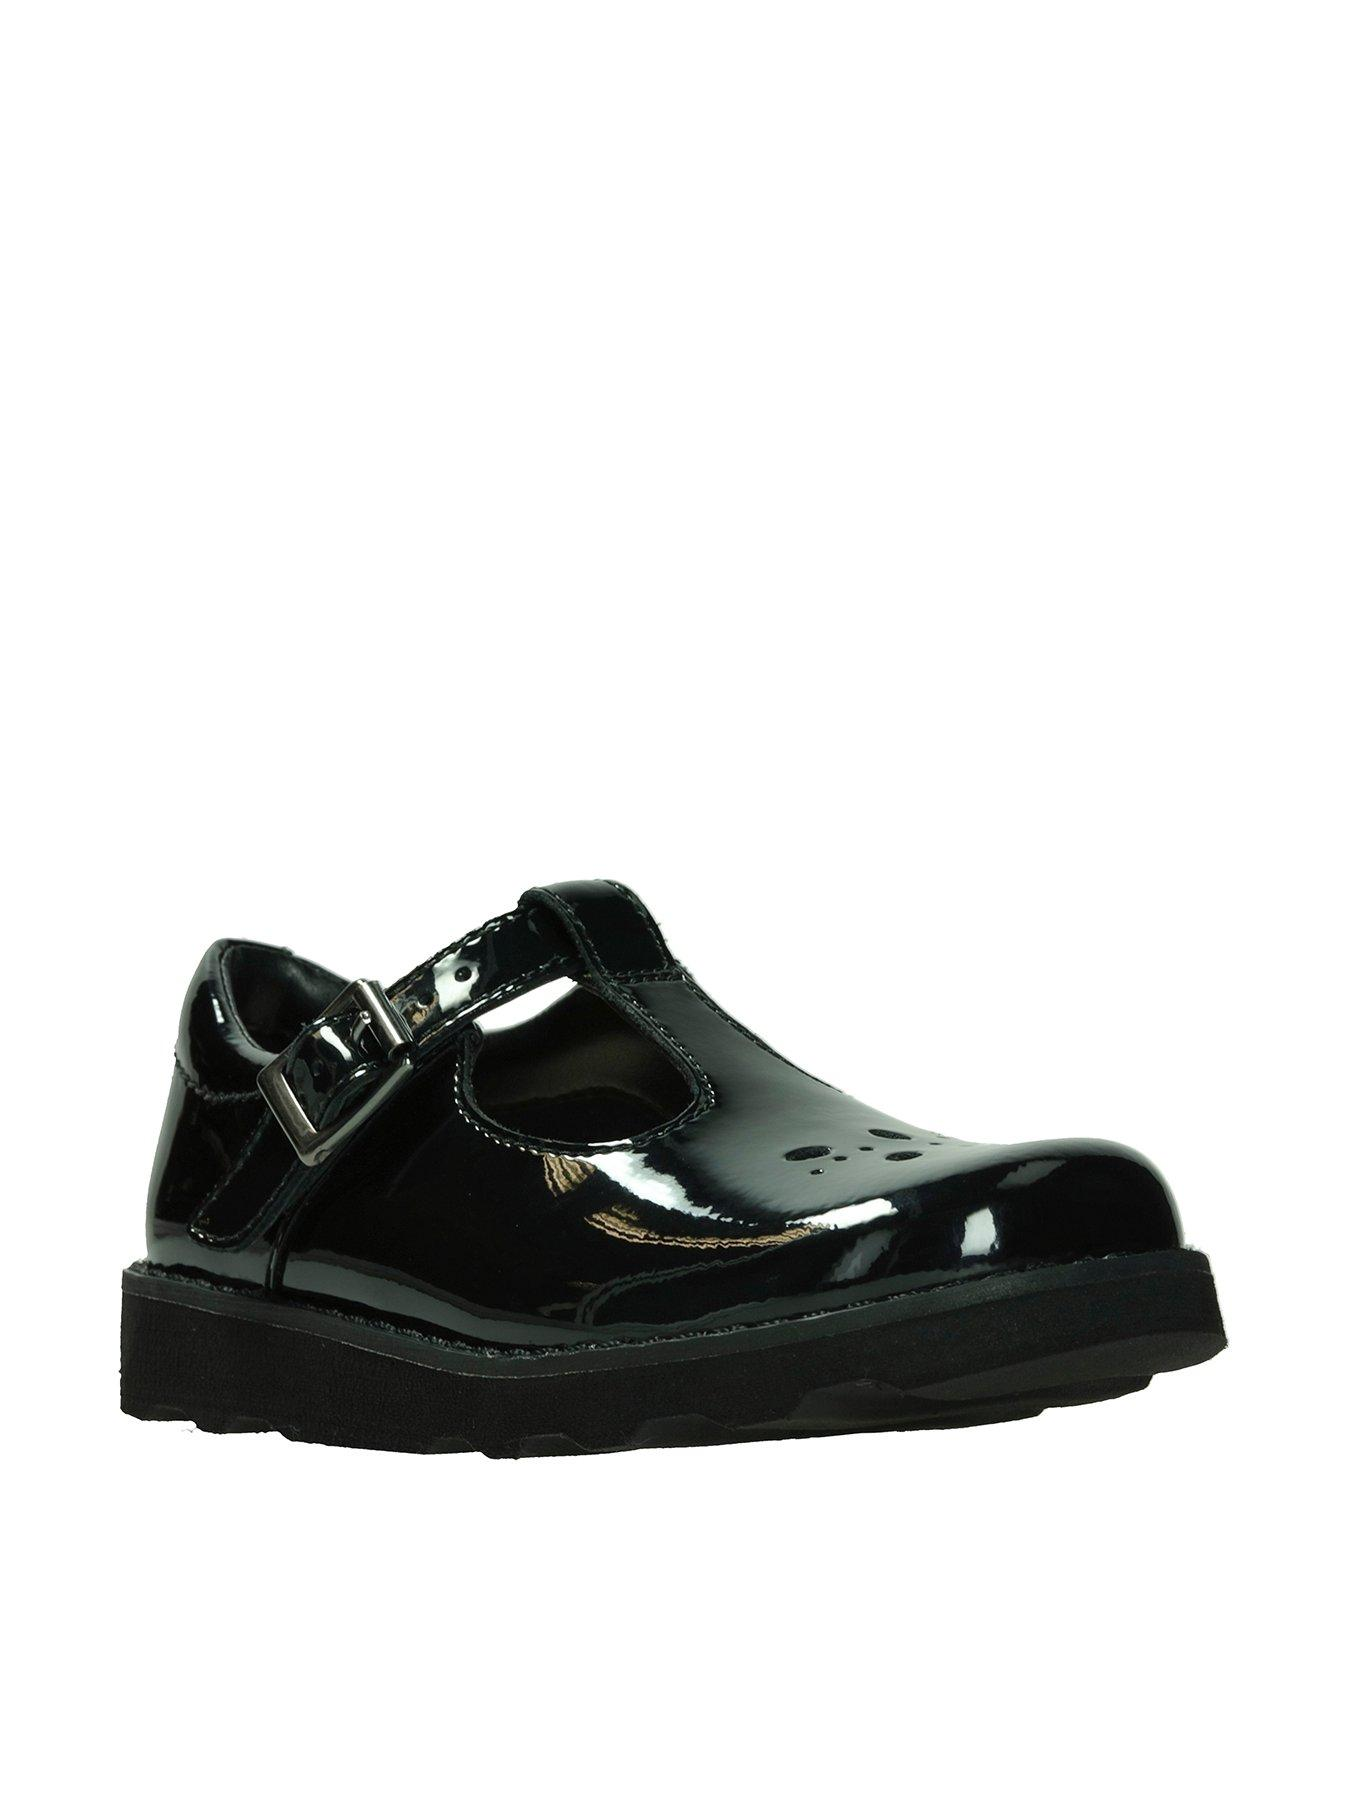 Clarks Girls Classic T-Bar Shoes Crown Wish